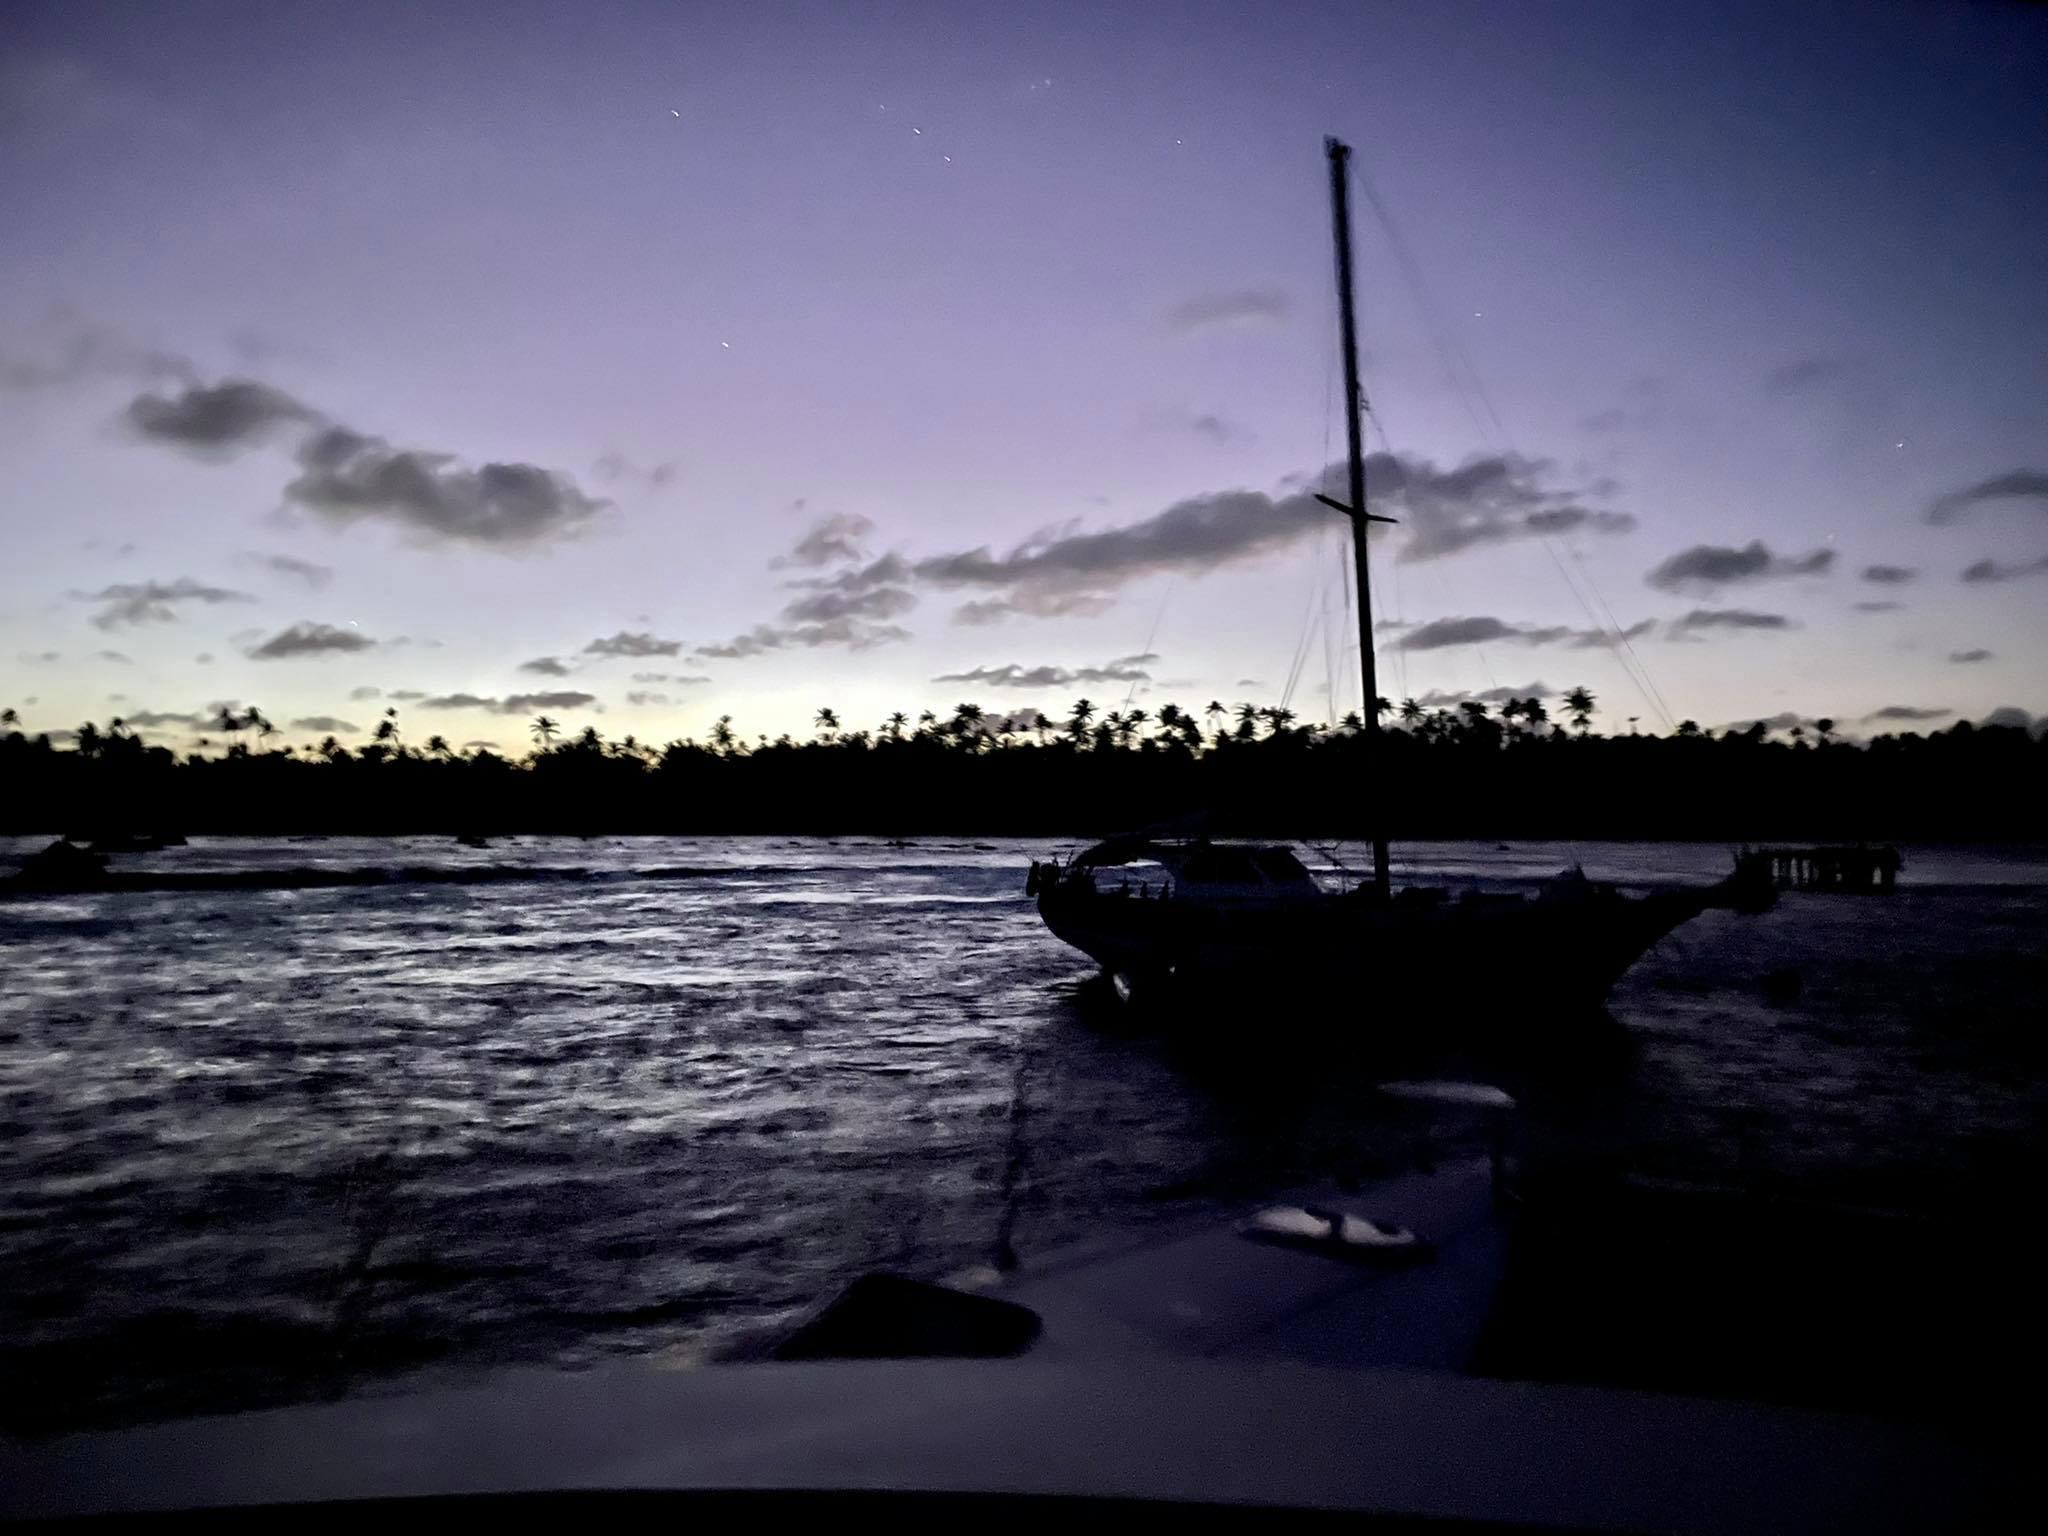 http://tahitivoileetlagon.com/wp-content/uploads/2021/07/nuit-TETIAROA.jpg